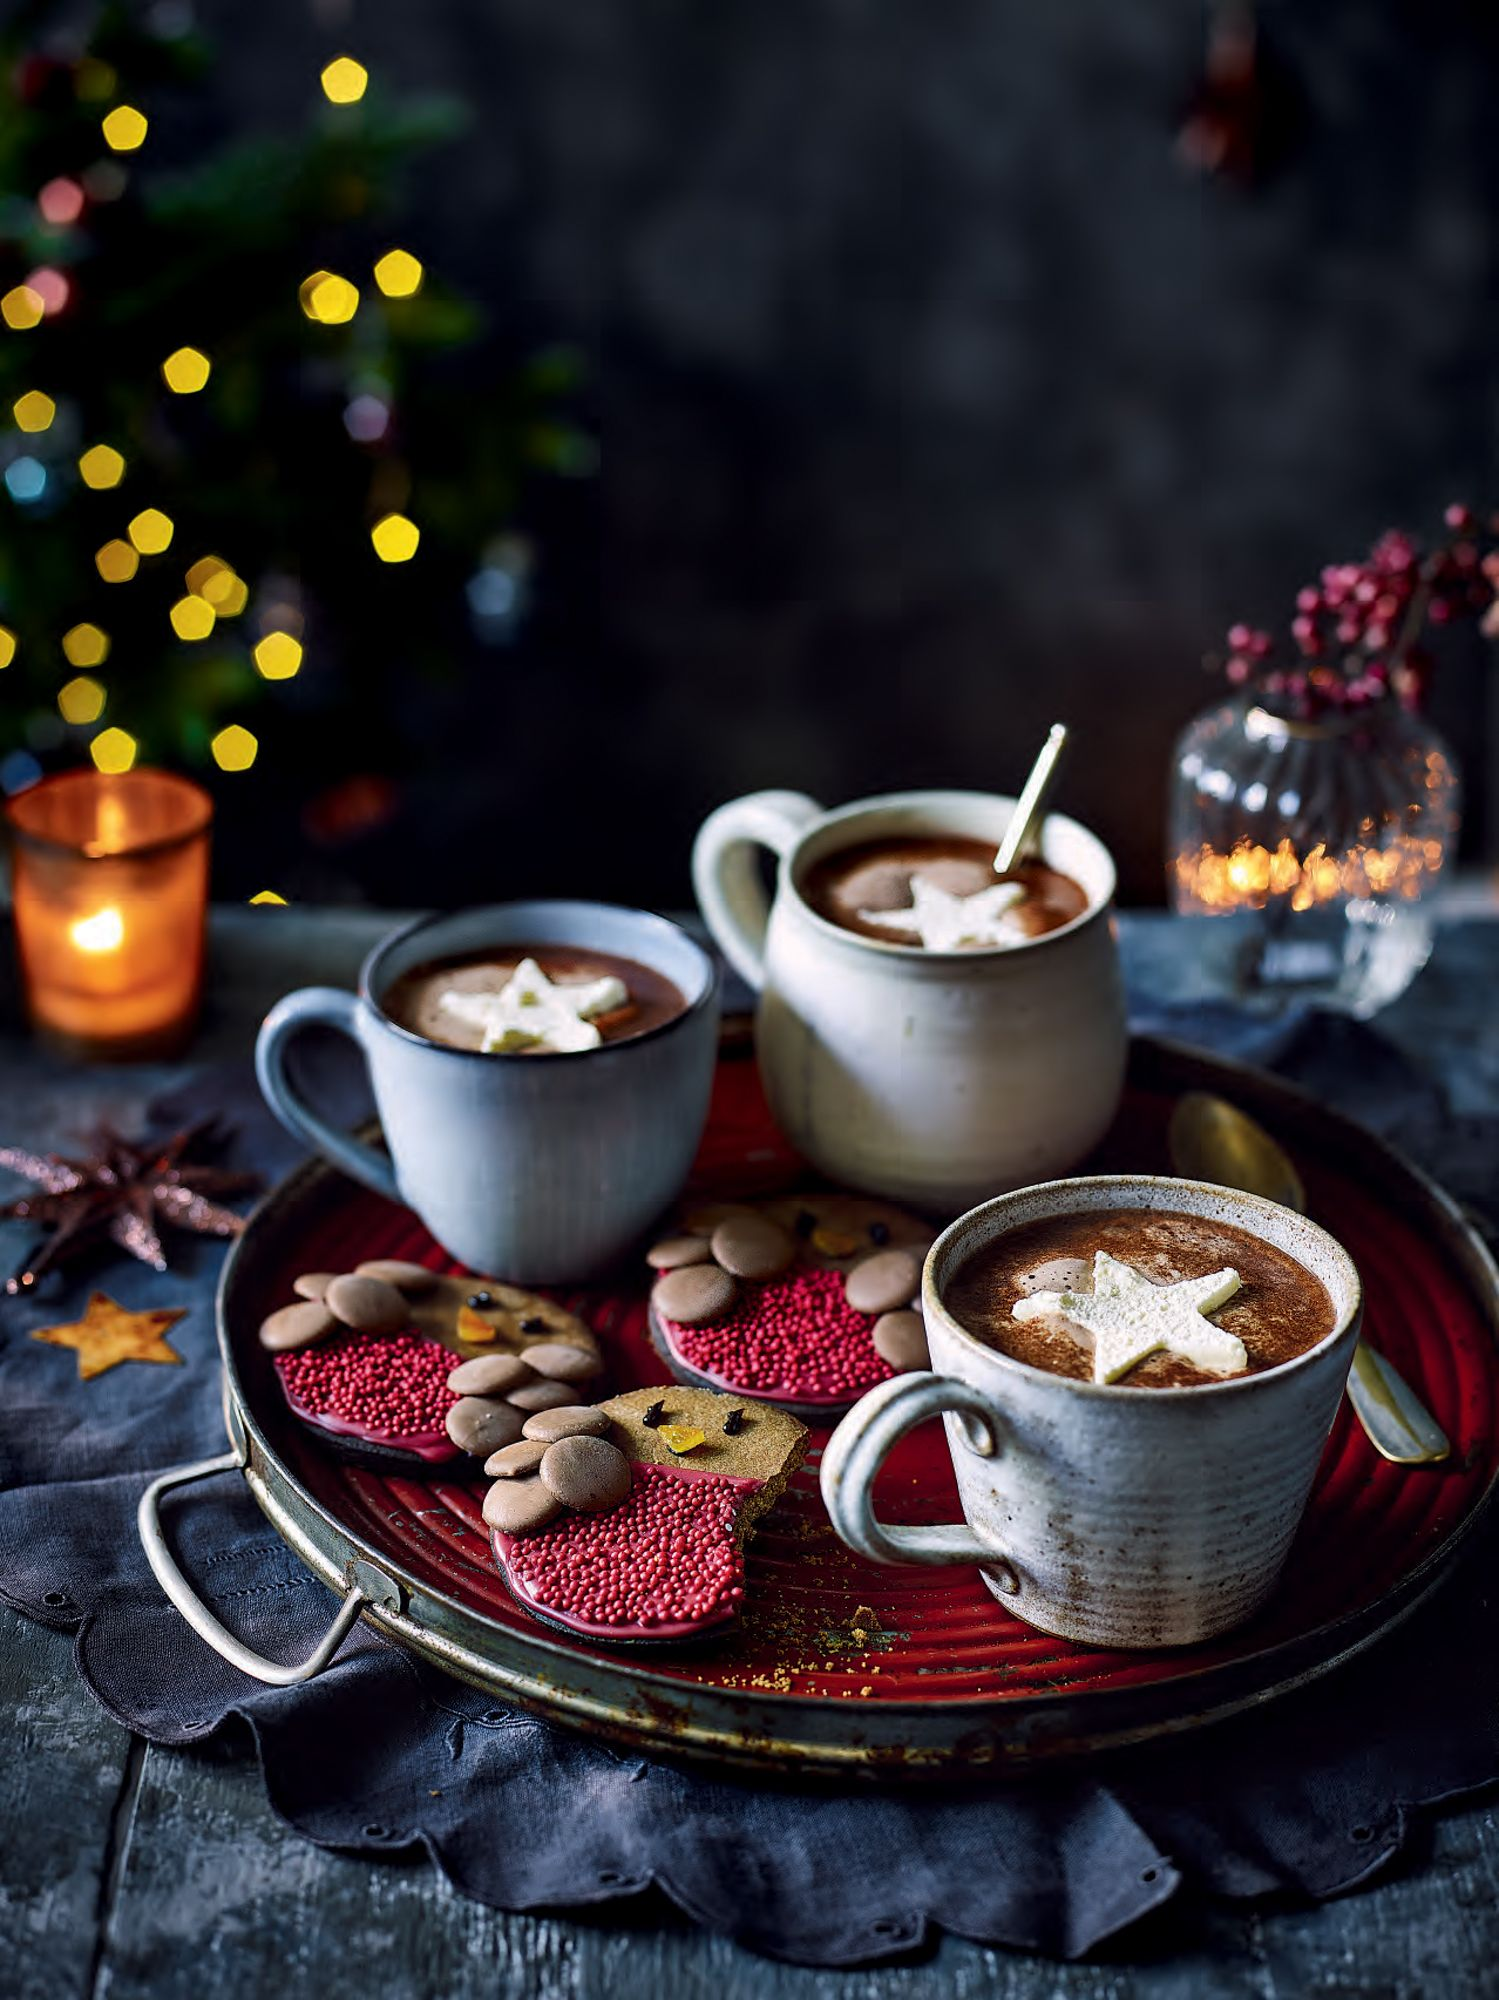 Tesco magazine Christmas 2017 in 2020 Hot chocolate